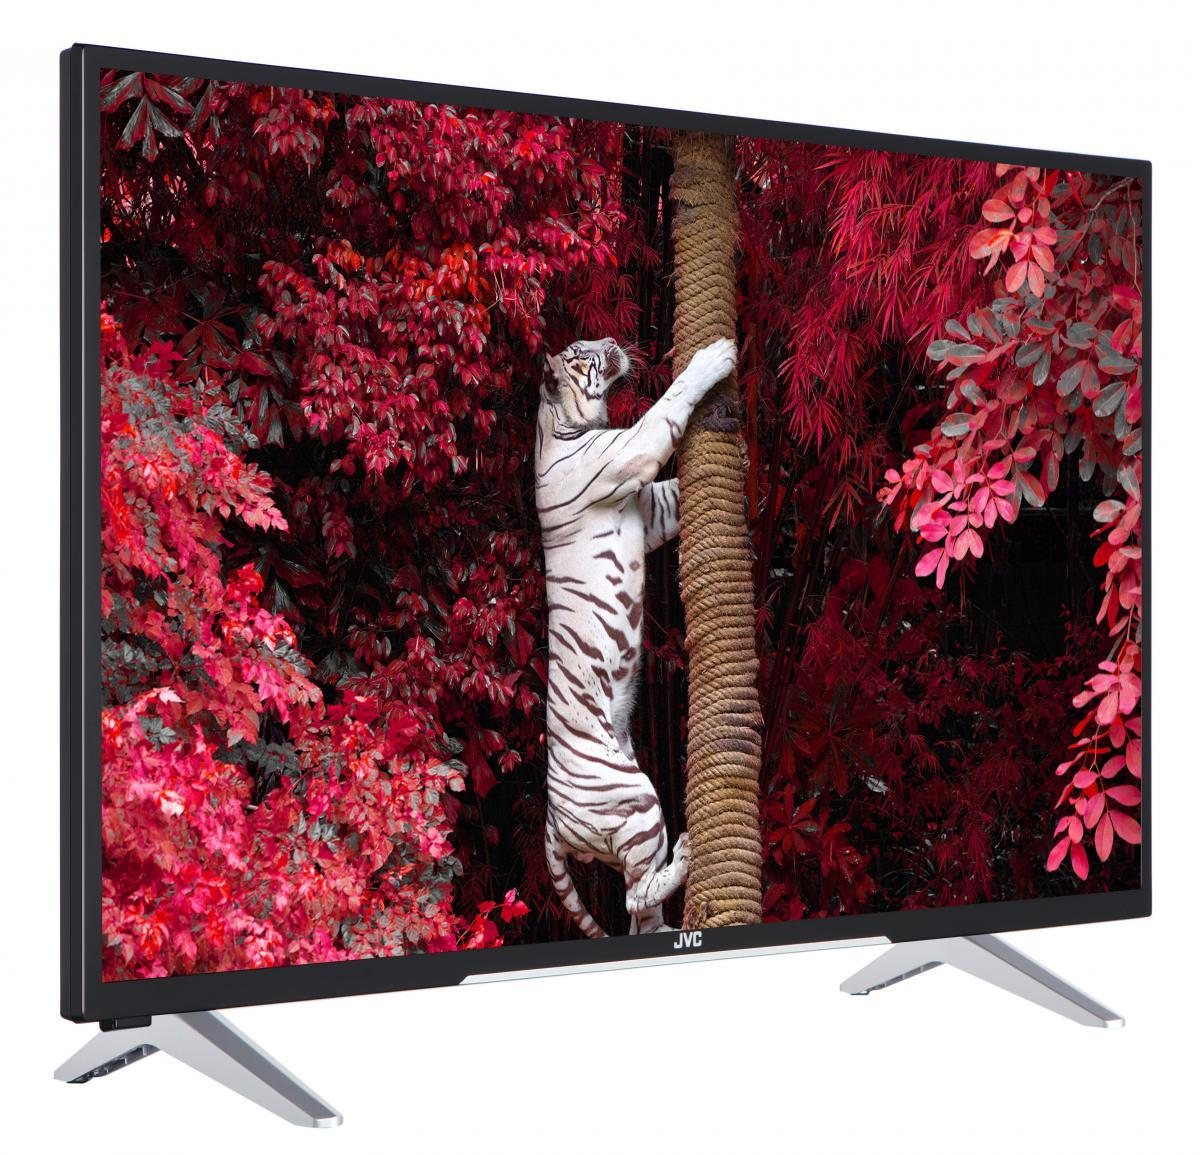 "Bild 2 von JVC LED TV 40"" (102 cm)"